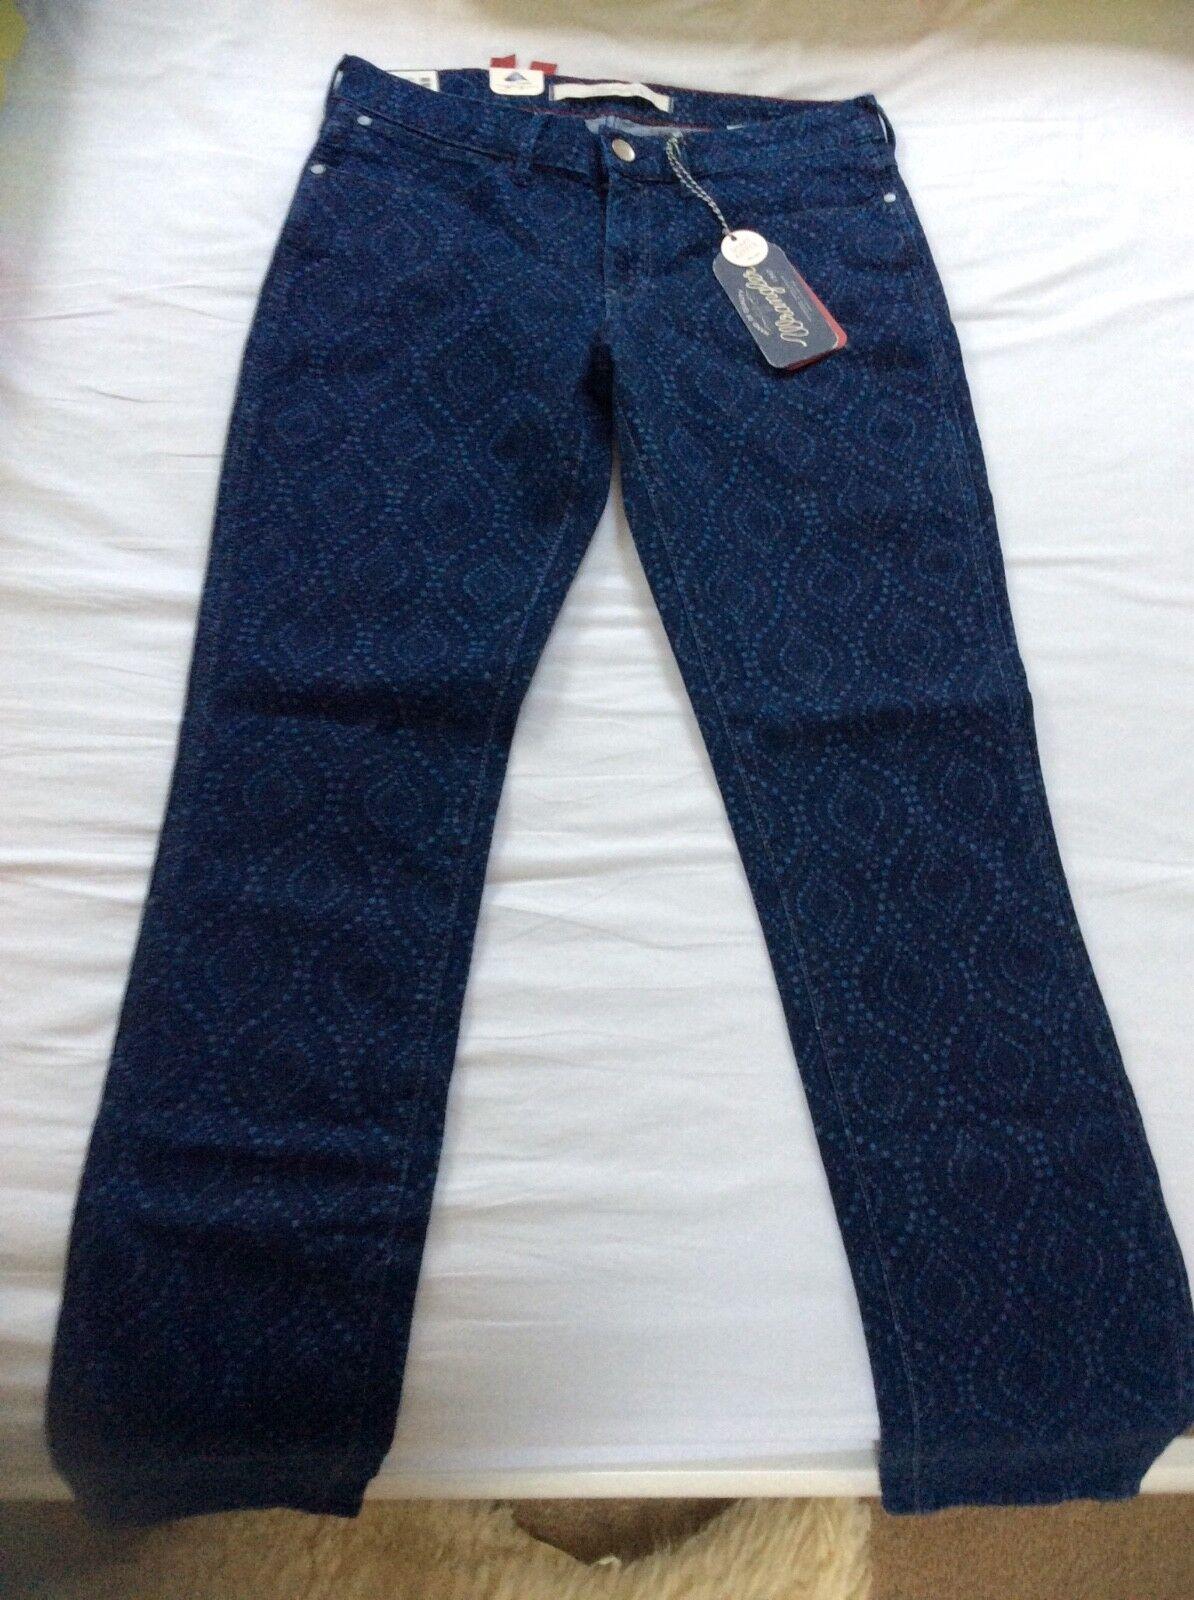 New Wrangler Corynn Shape Keeper Jeans 29x32